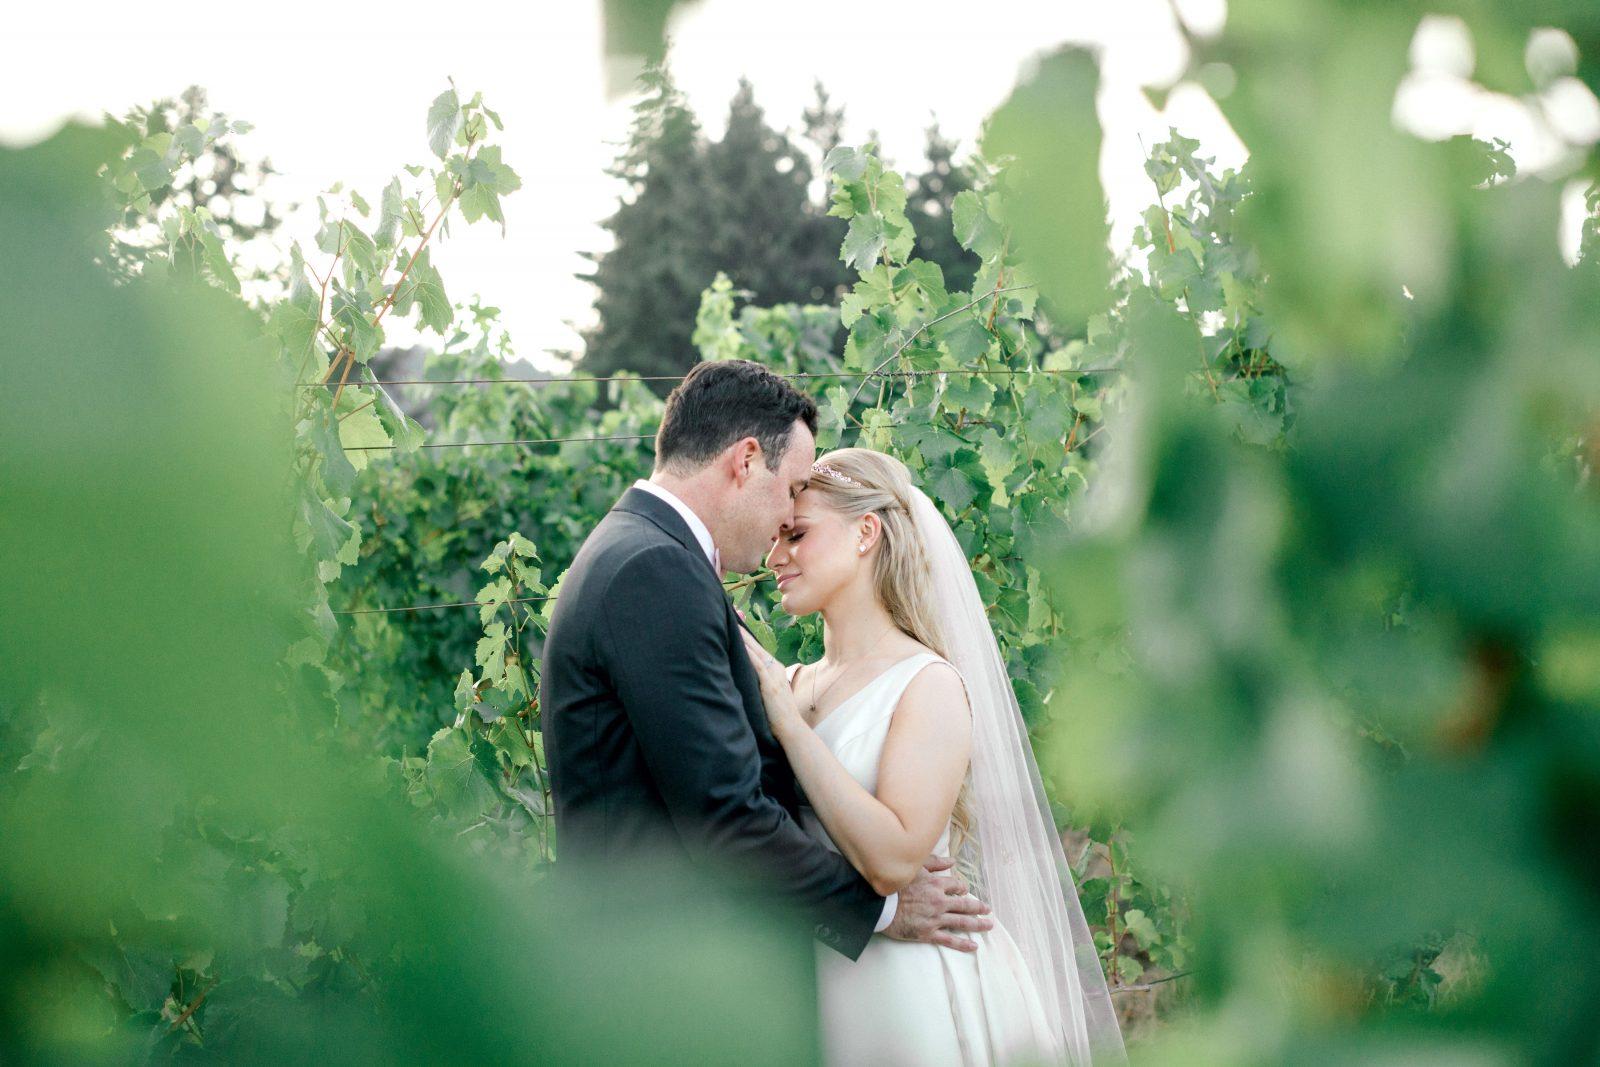 18-8-John-Lauren-Beacon-Hill-Vineyard-Winery-Wedding-Portland-Oregon-Destination-Photographer-Zeeqk-600 (1)